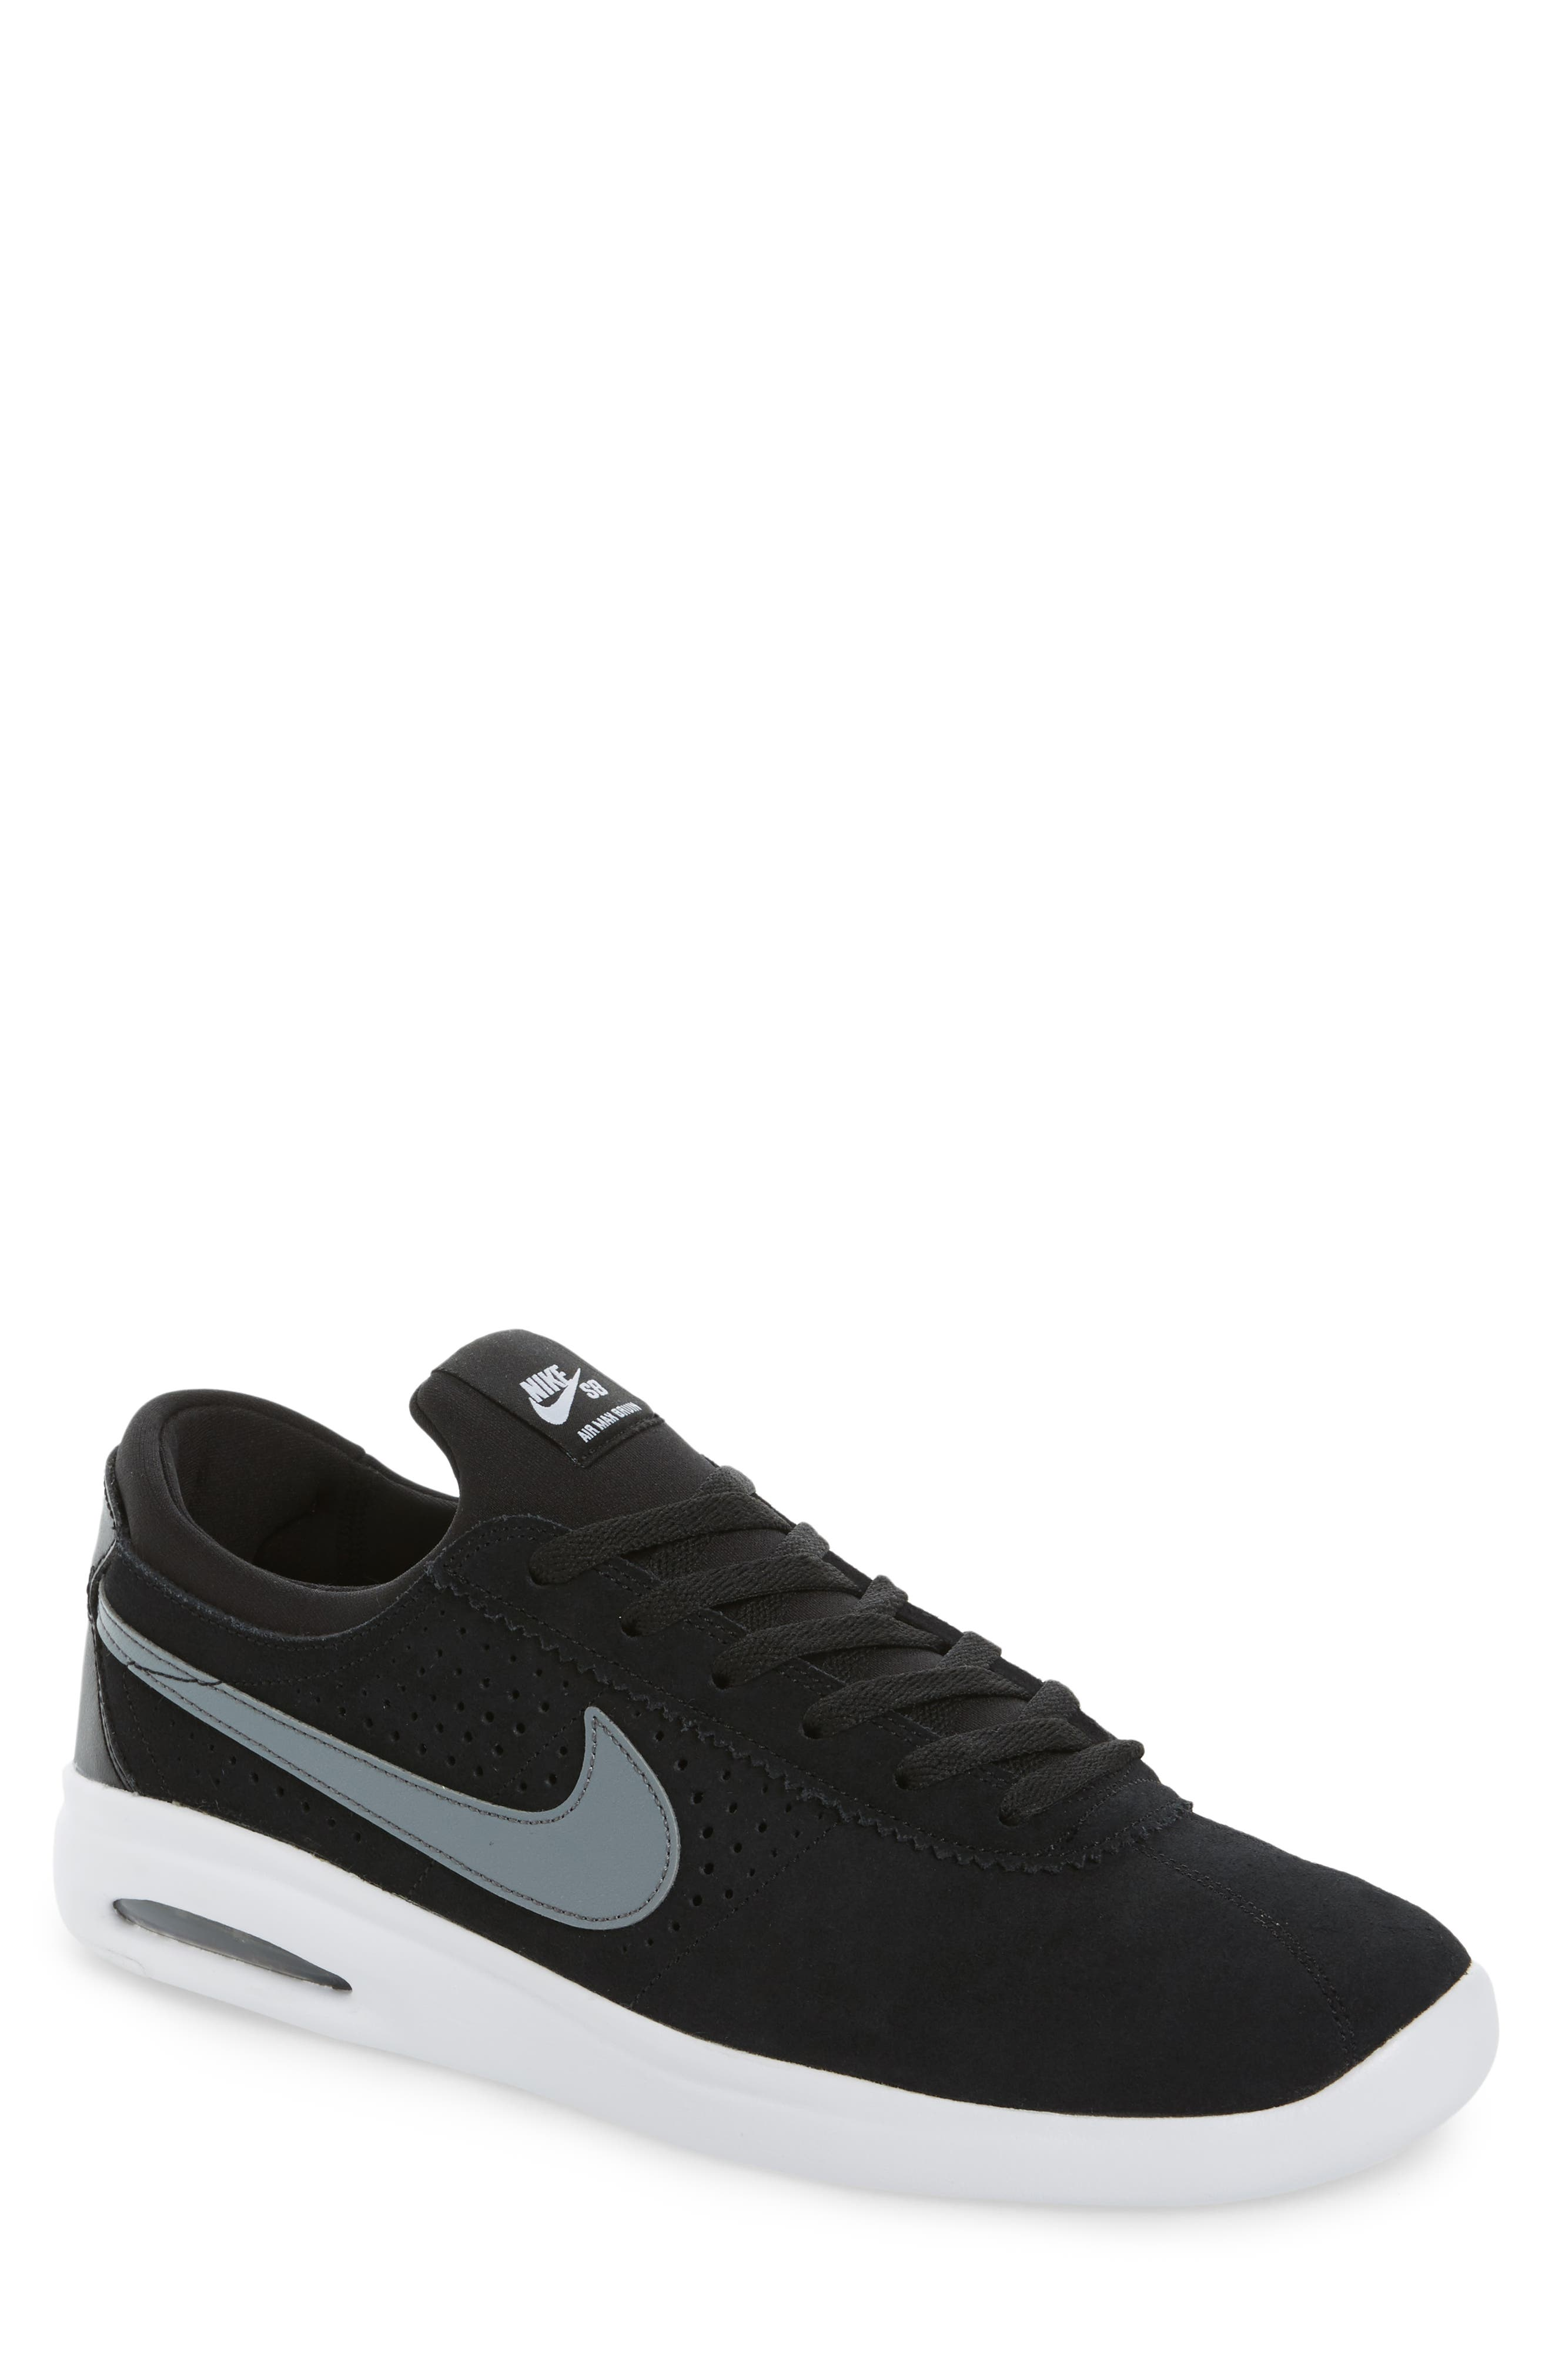 Alternate Image 1 Selected - Nike SB Air Max Bruin Vapor Skateboarding Sneaker (Men)